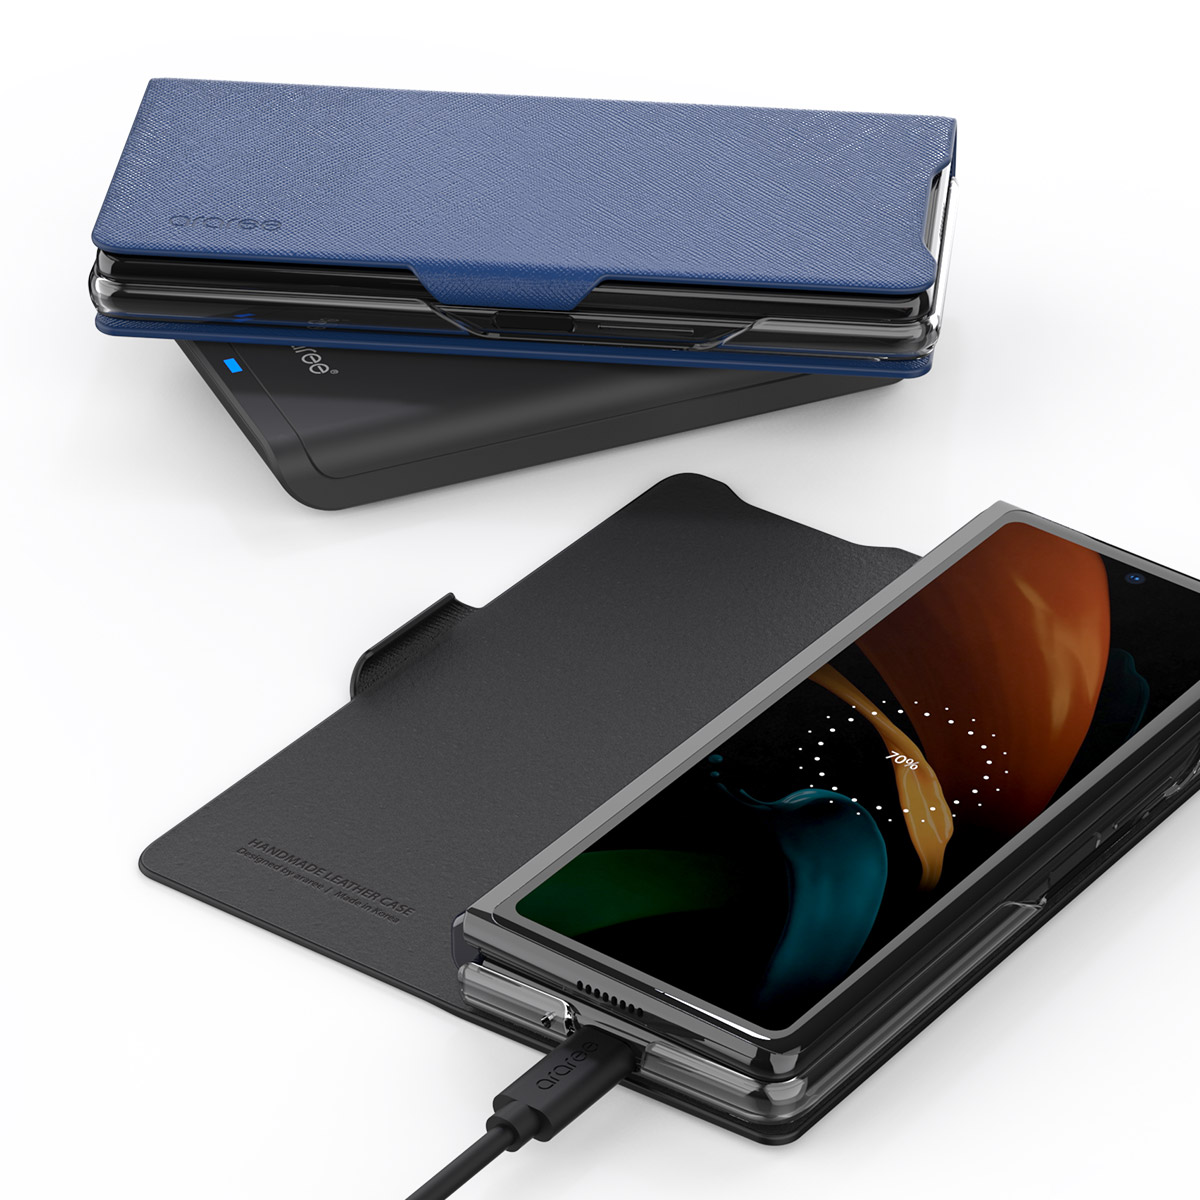 araree BONNET STAND【Galaxy Z Fold2 5G 手帳型ケース】マグネットクロージング スタンド機能付き SCG05